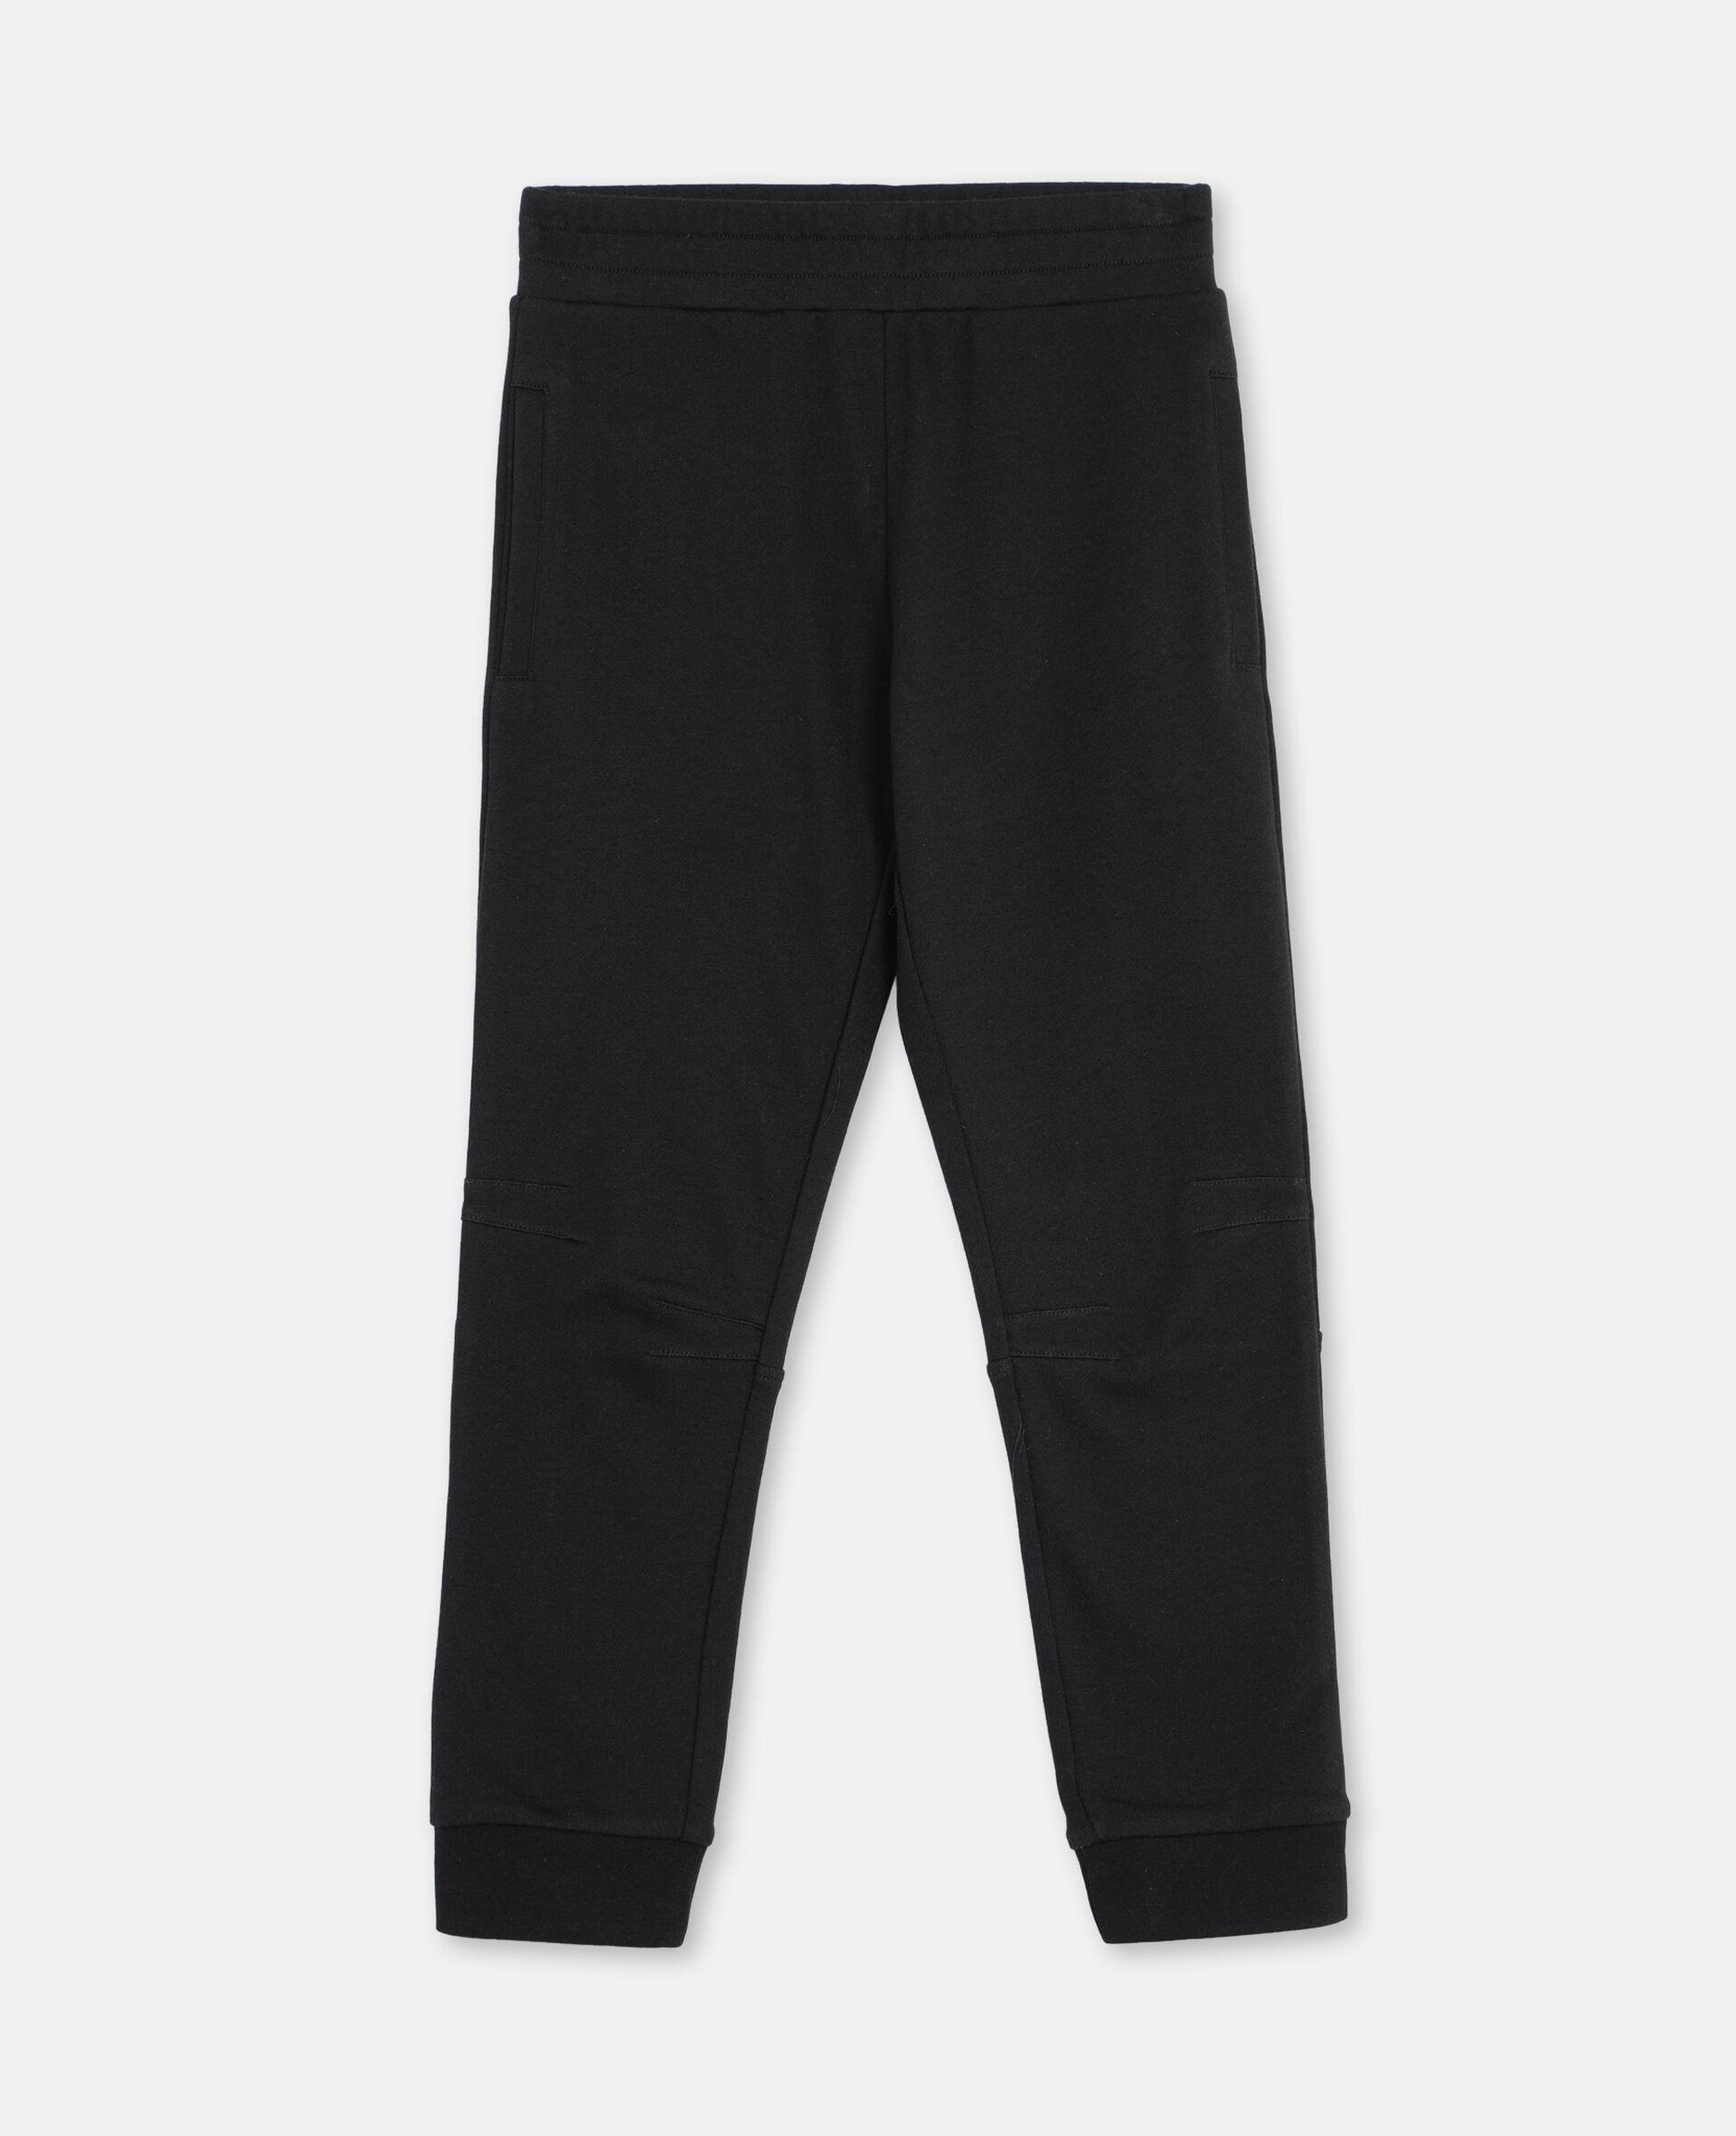 Basic 棉质运动裤 -黑色-large image number 0